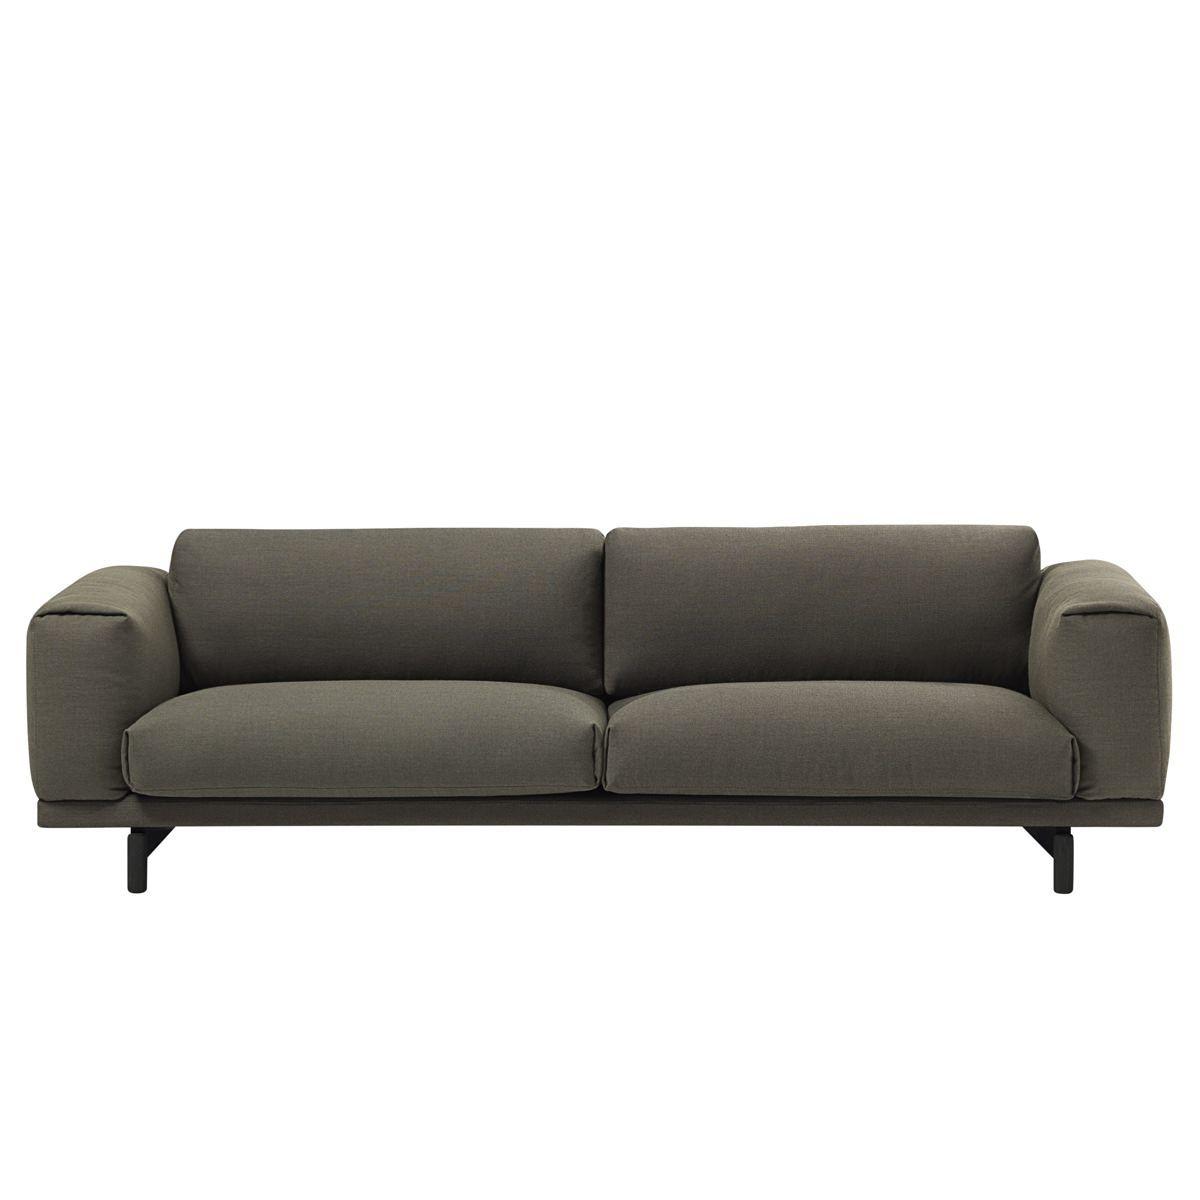 Muuto Rest Sofa